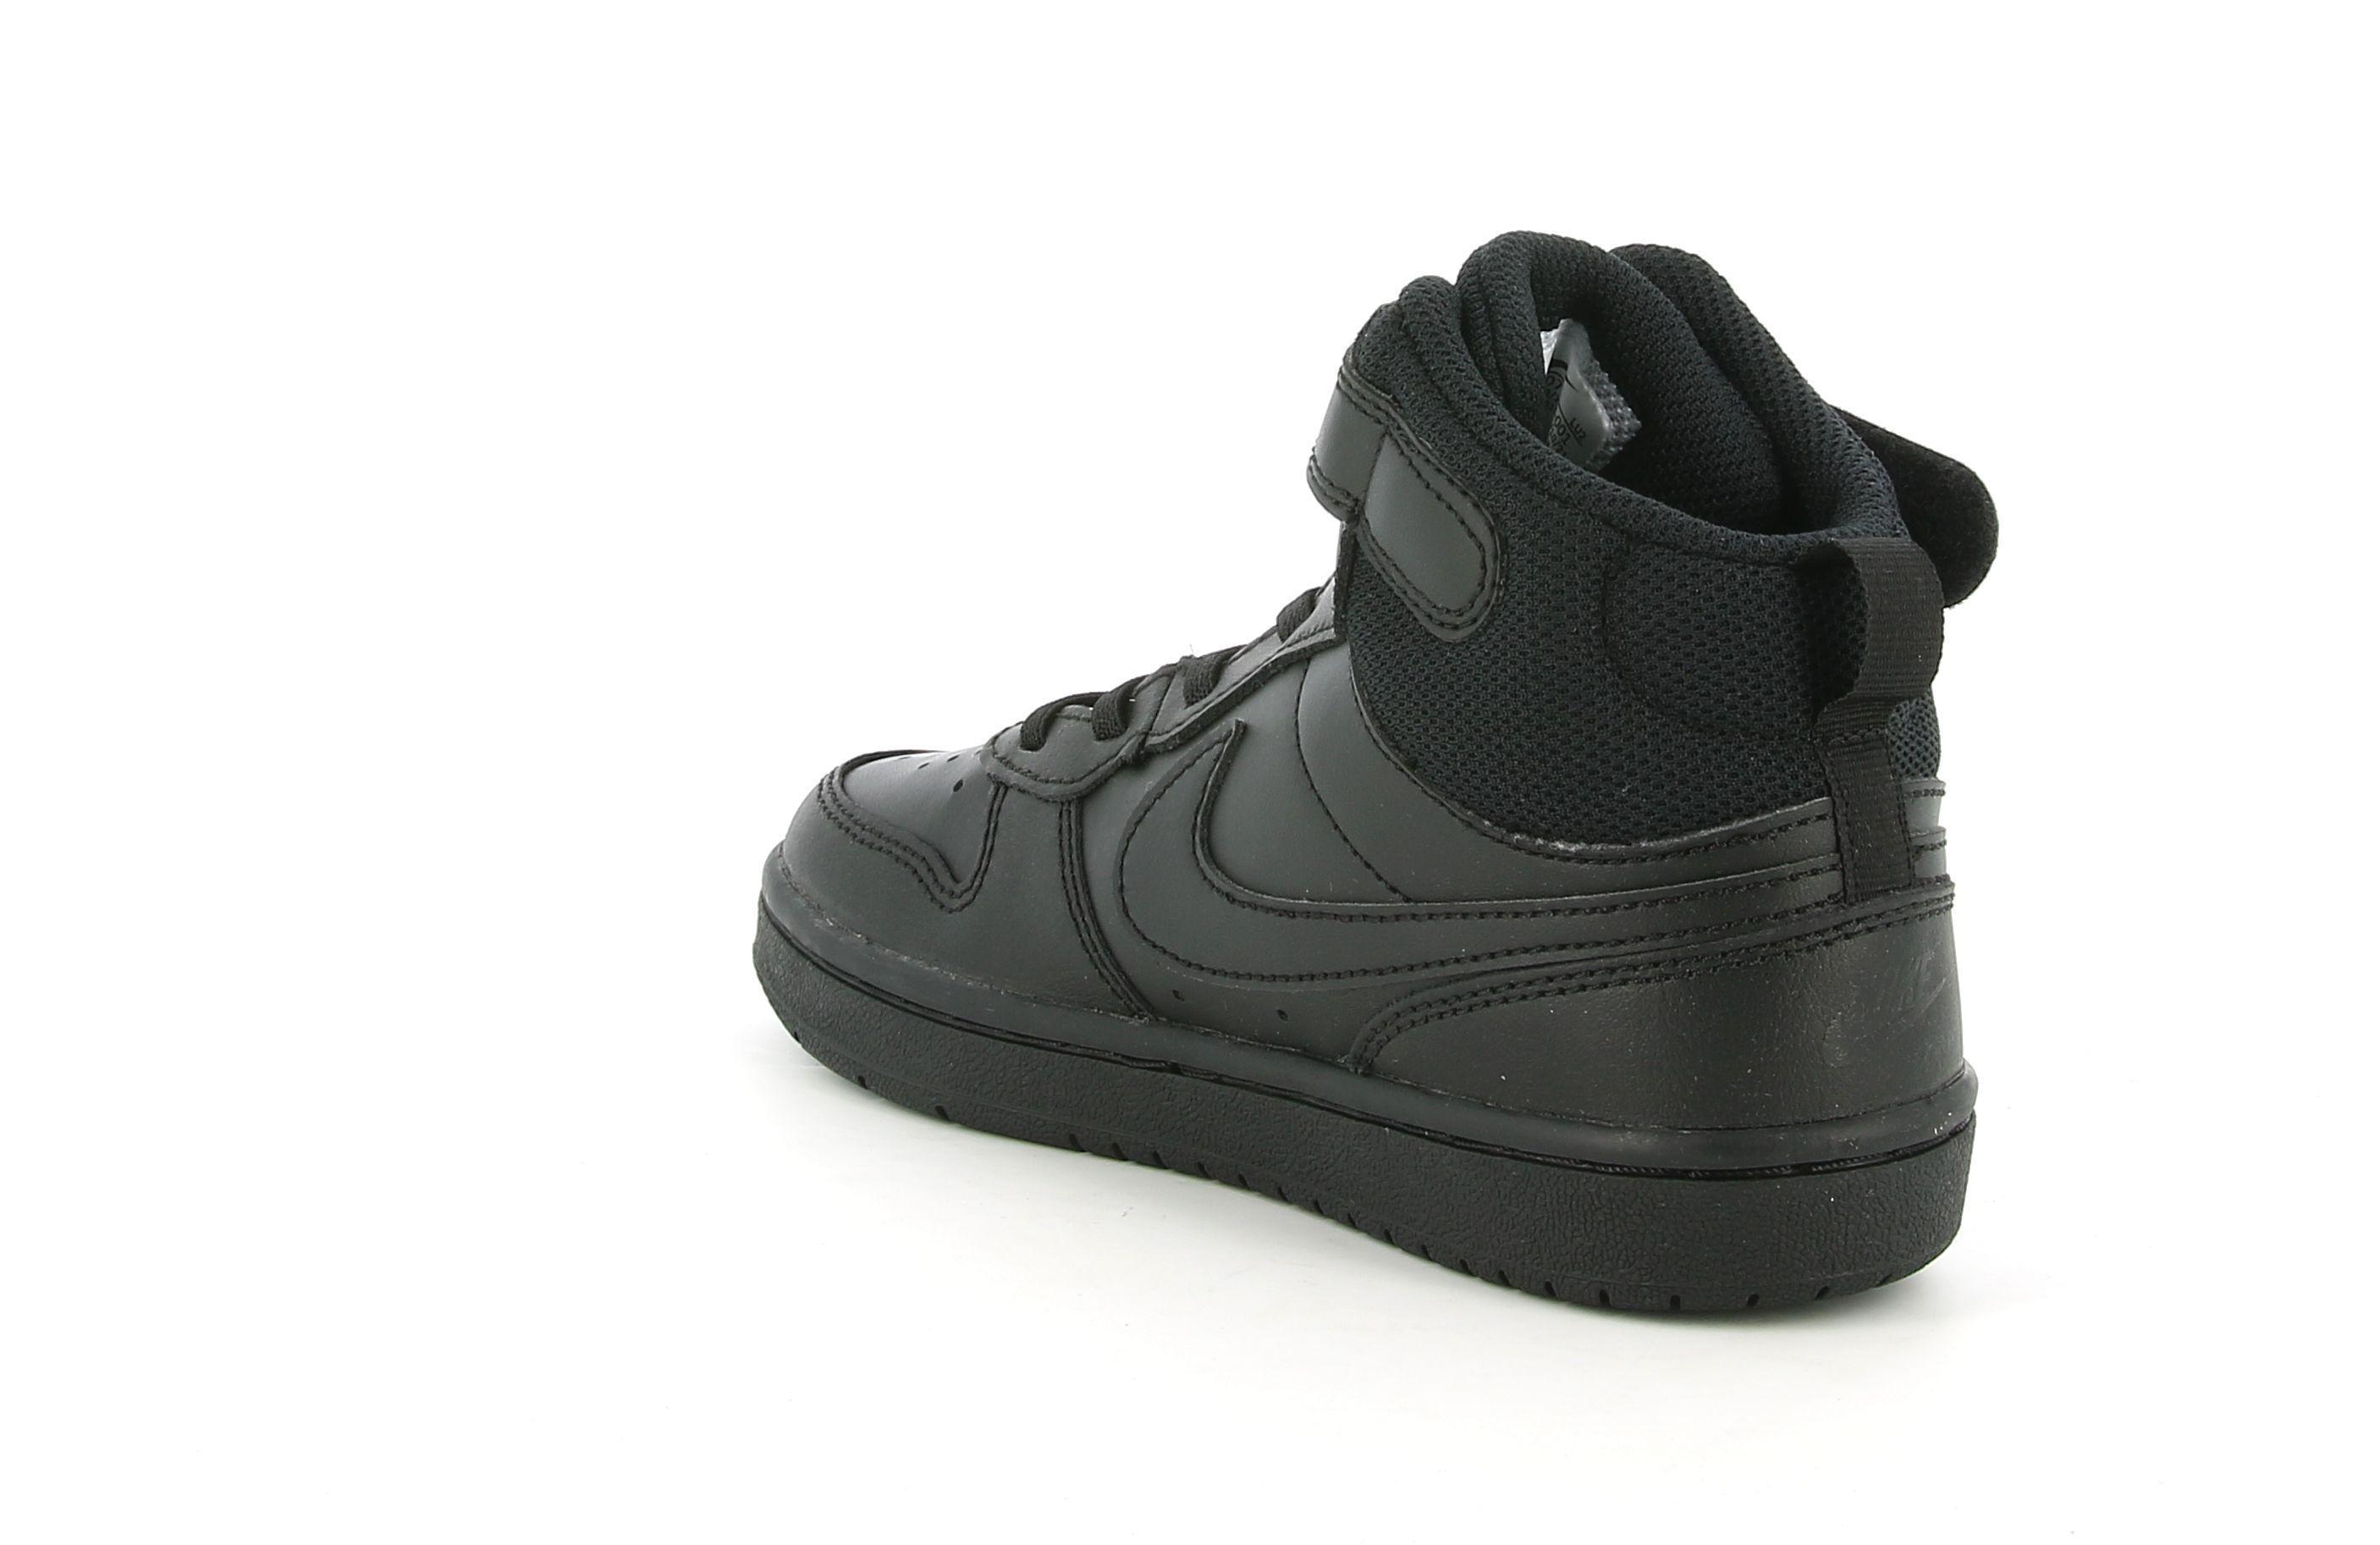 nike nike court borough mid 2 cd7783 001 black/black bambino